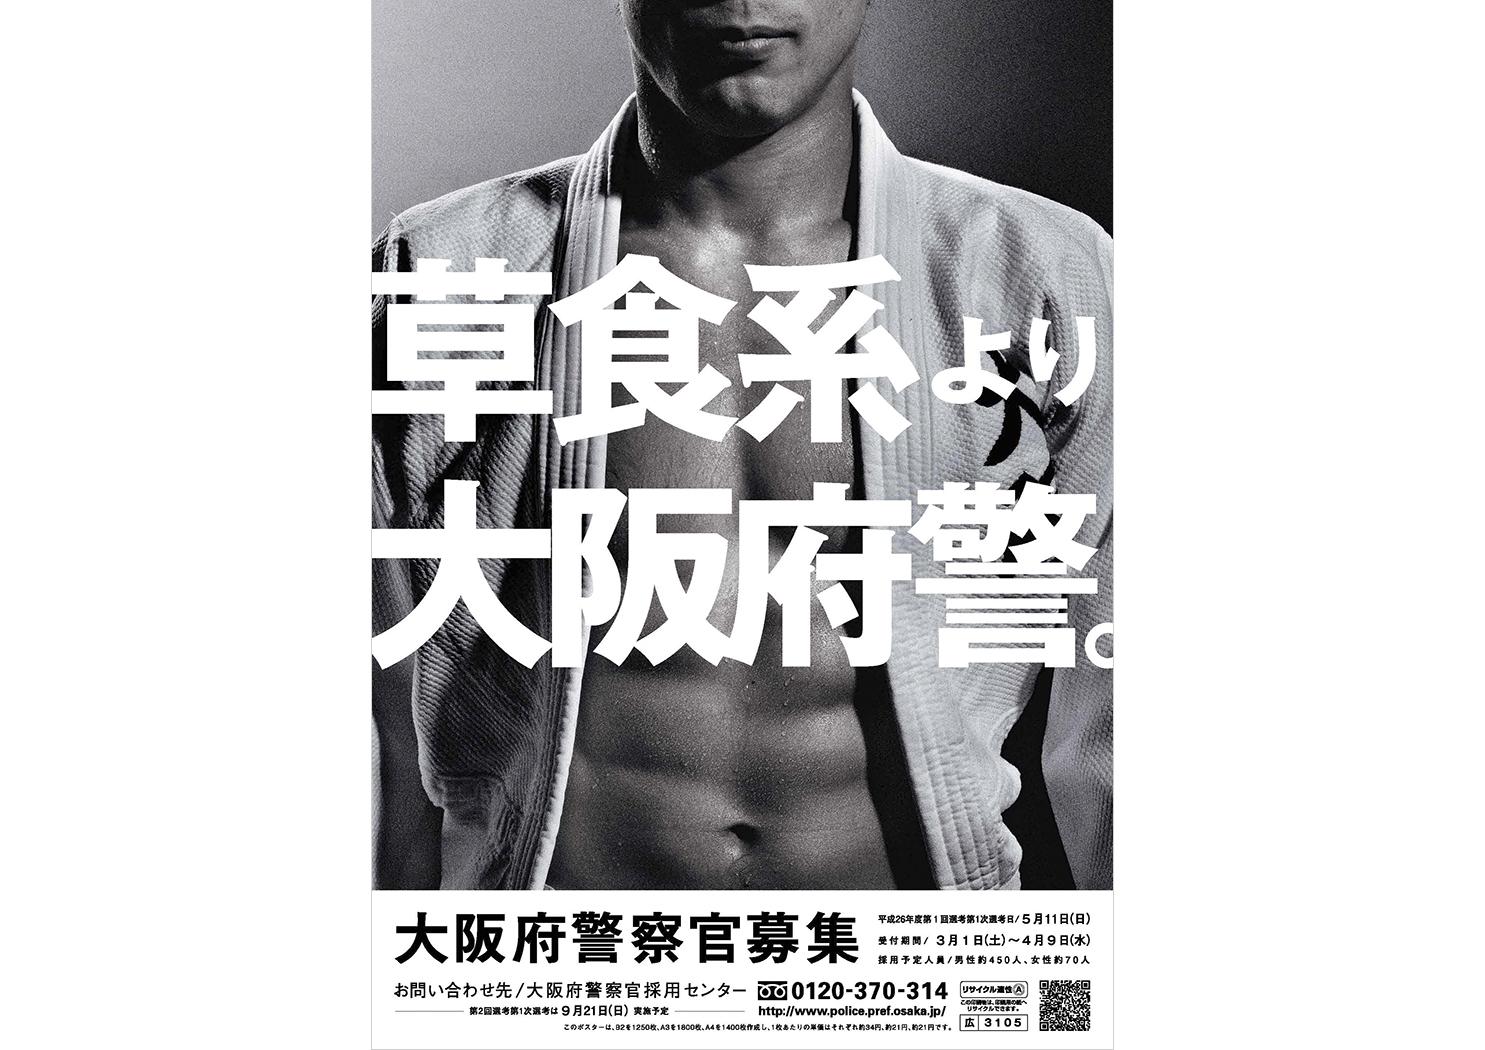 OSAKA POLICE poster